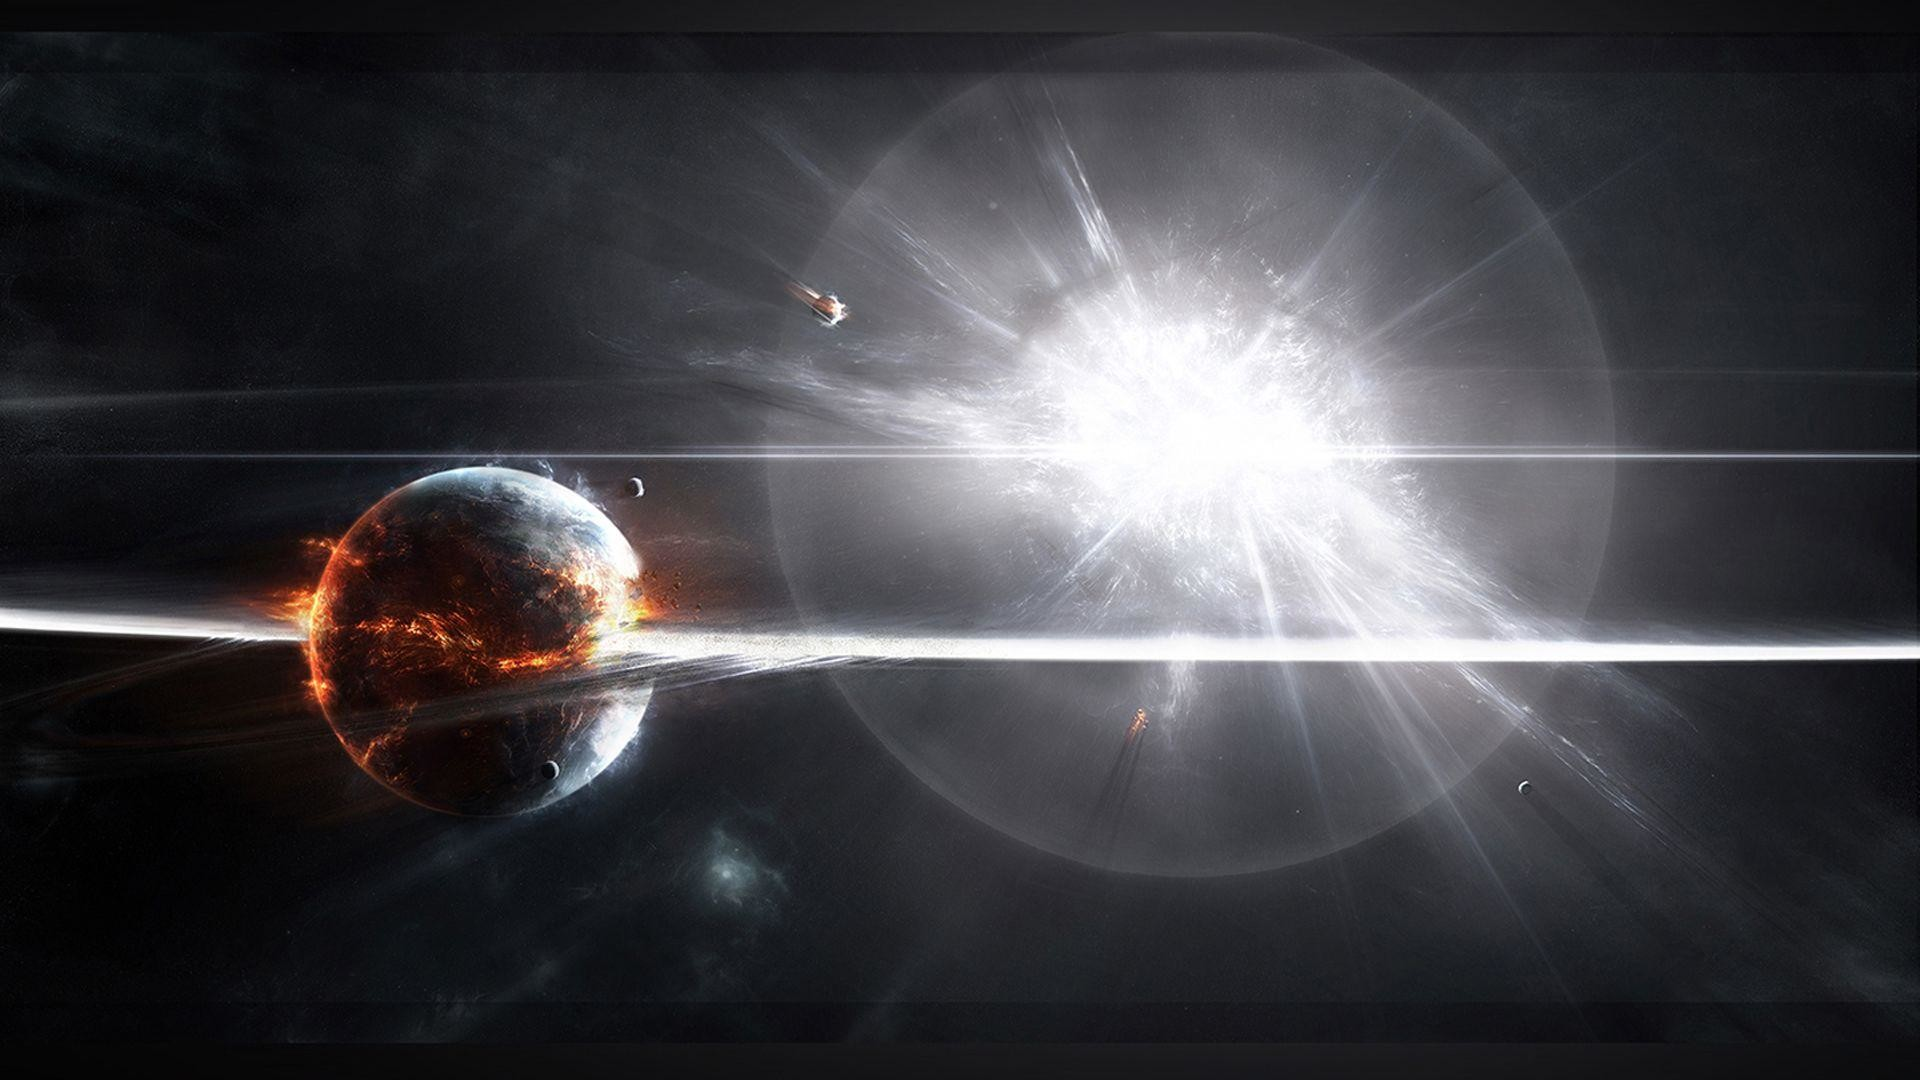 Wallpapers For > Supernova Wallpaper 1080p